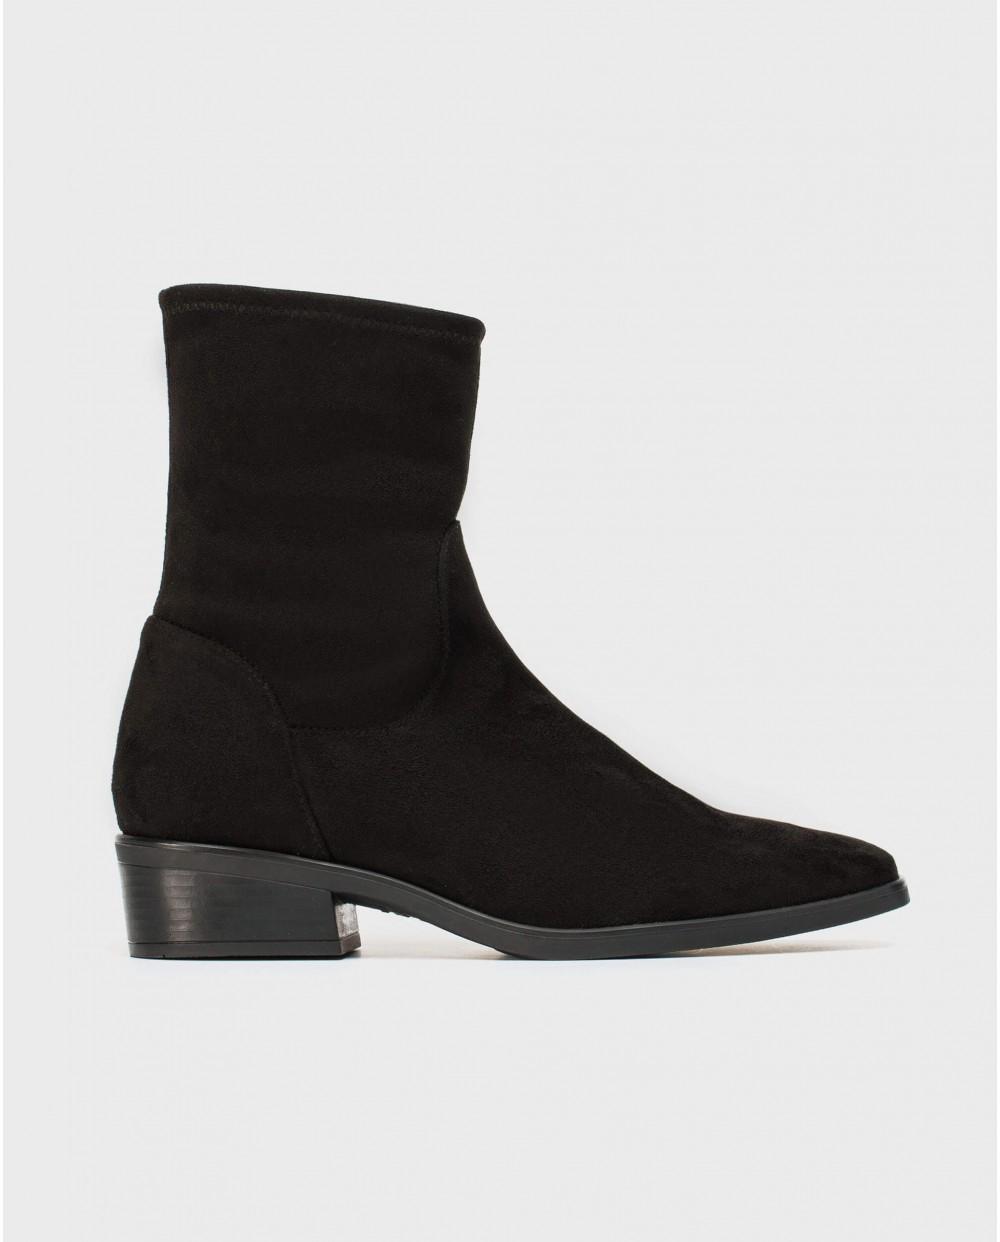 Wonders-Ankle Boots-Elastane sock boot